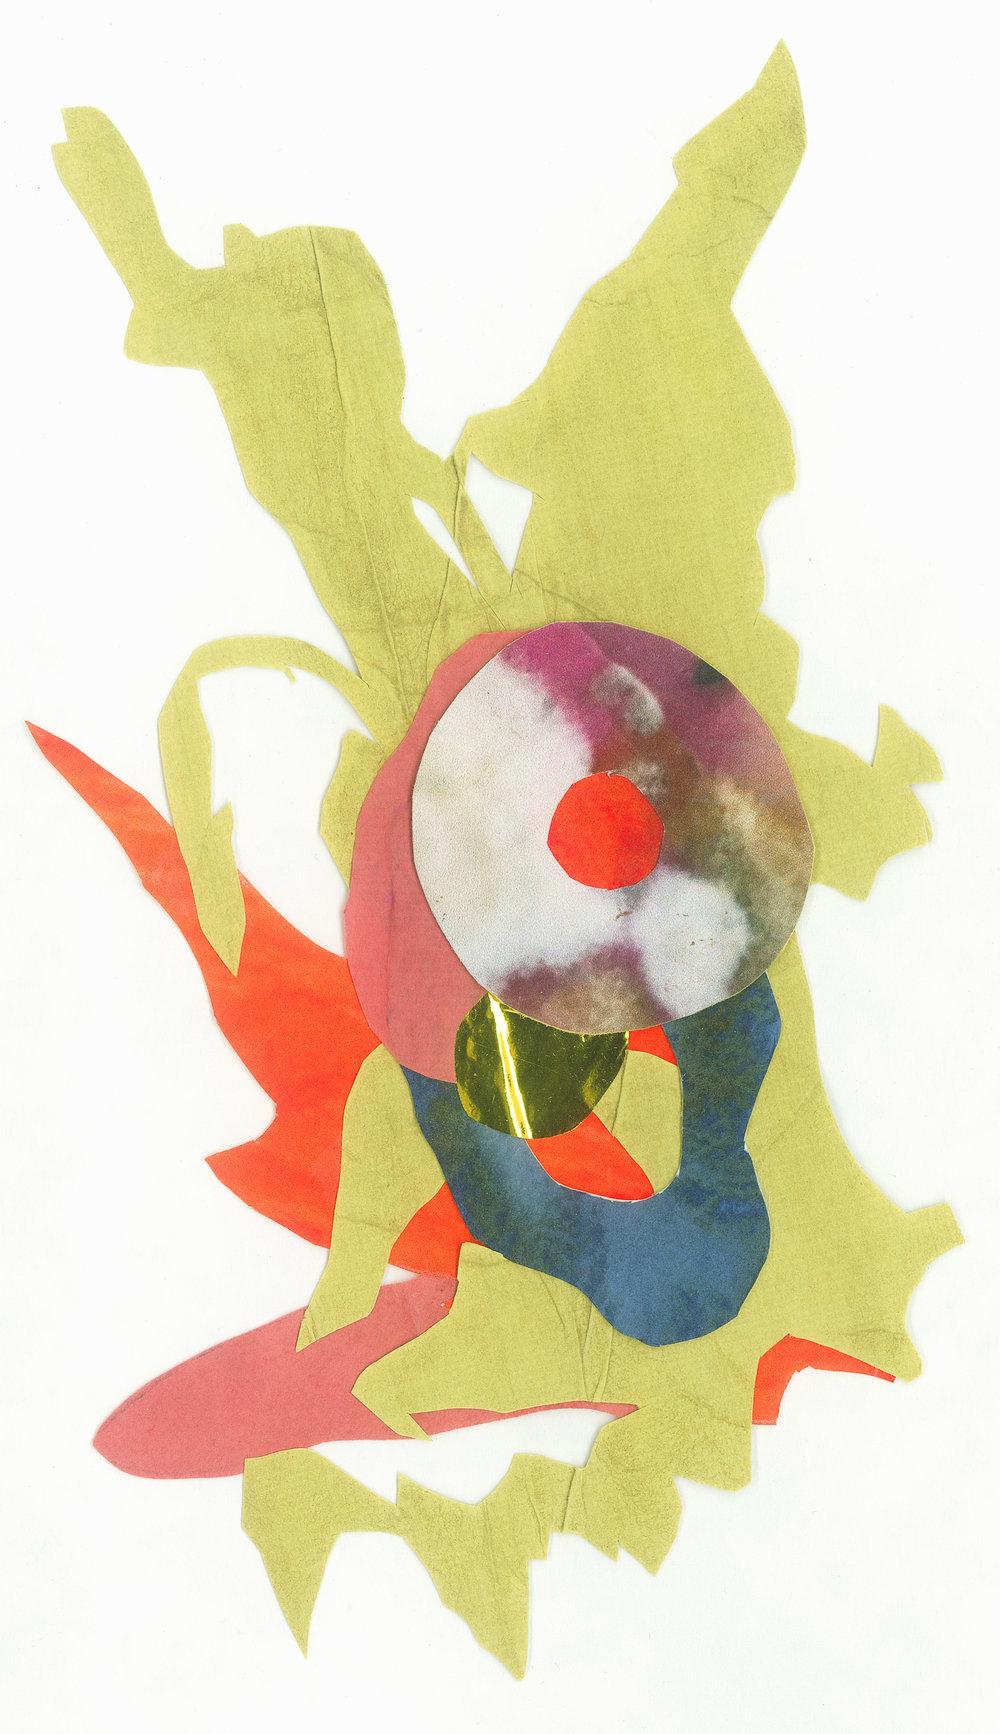 2018  Matcha dye, bloodwood dye, purple cabbage dye, metallic paper, and inkjet prints on paper.   At largest: 12 x 5 cm.